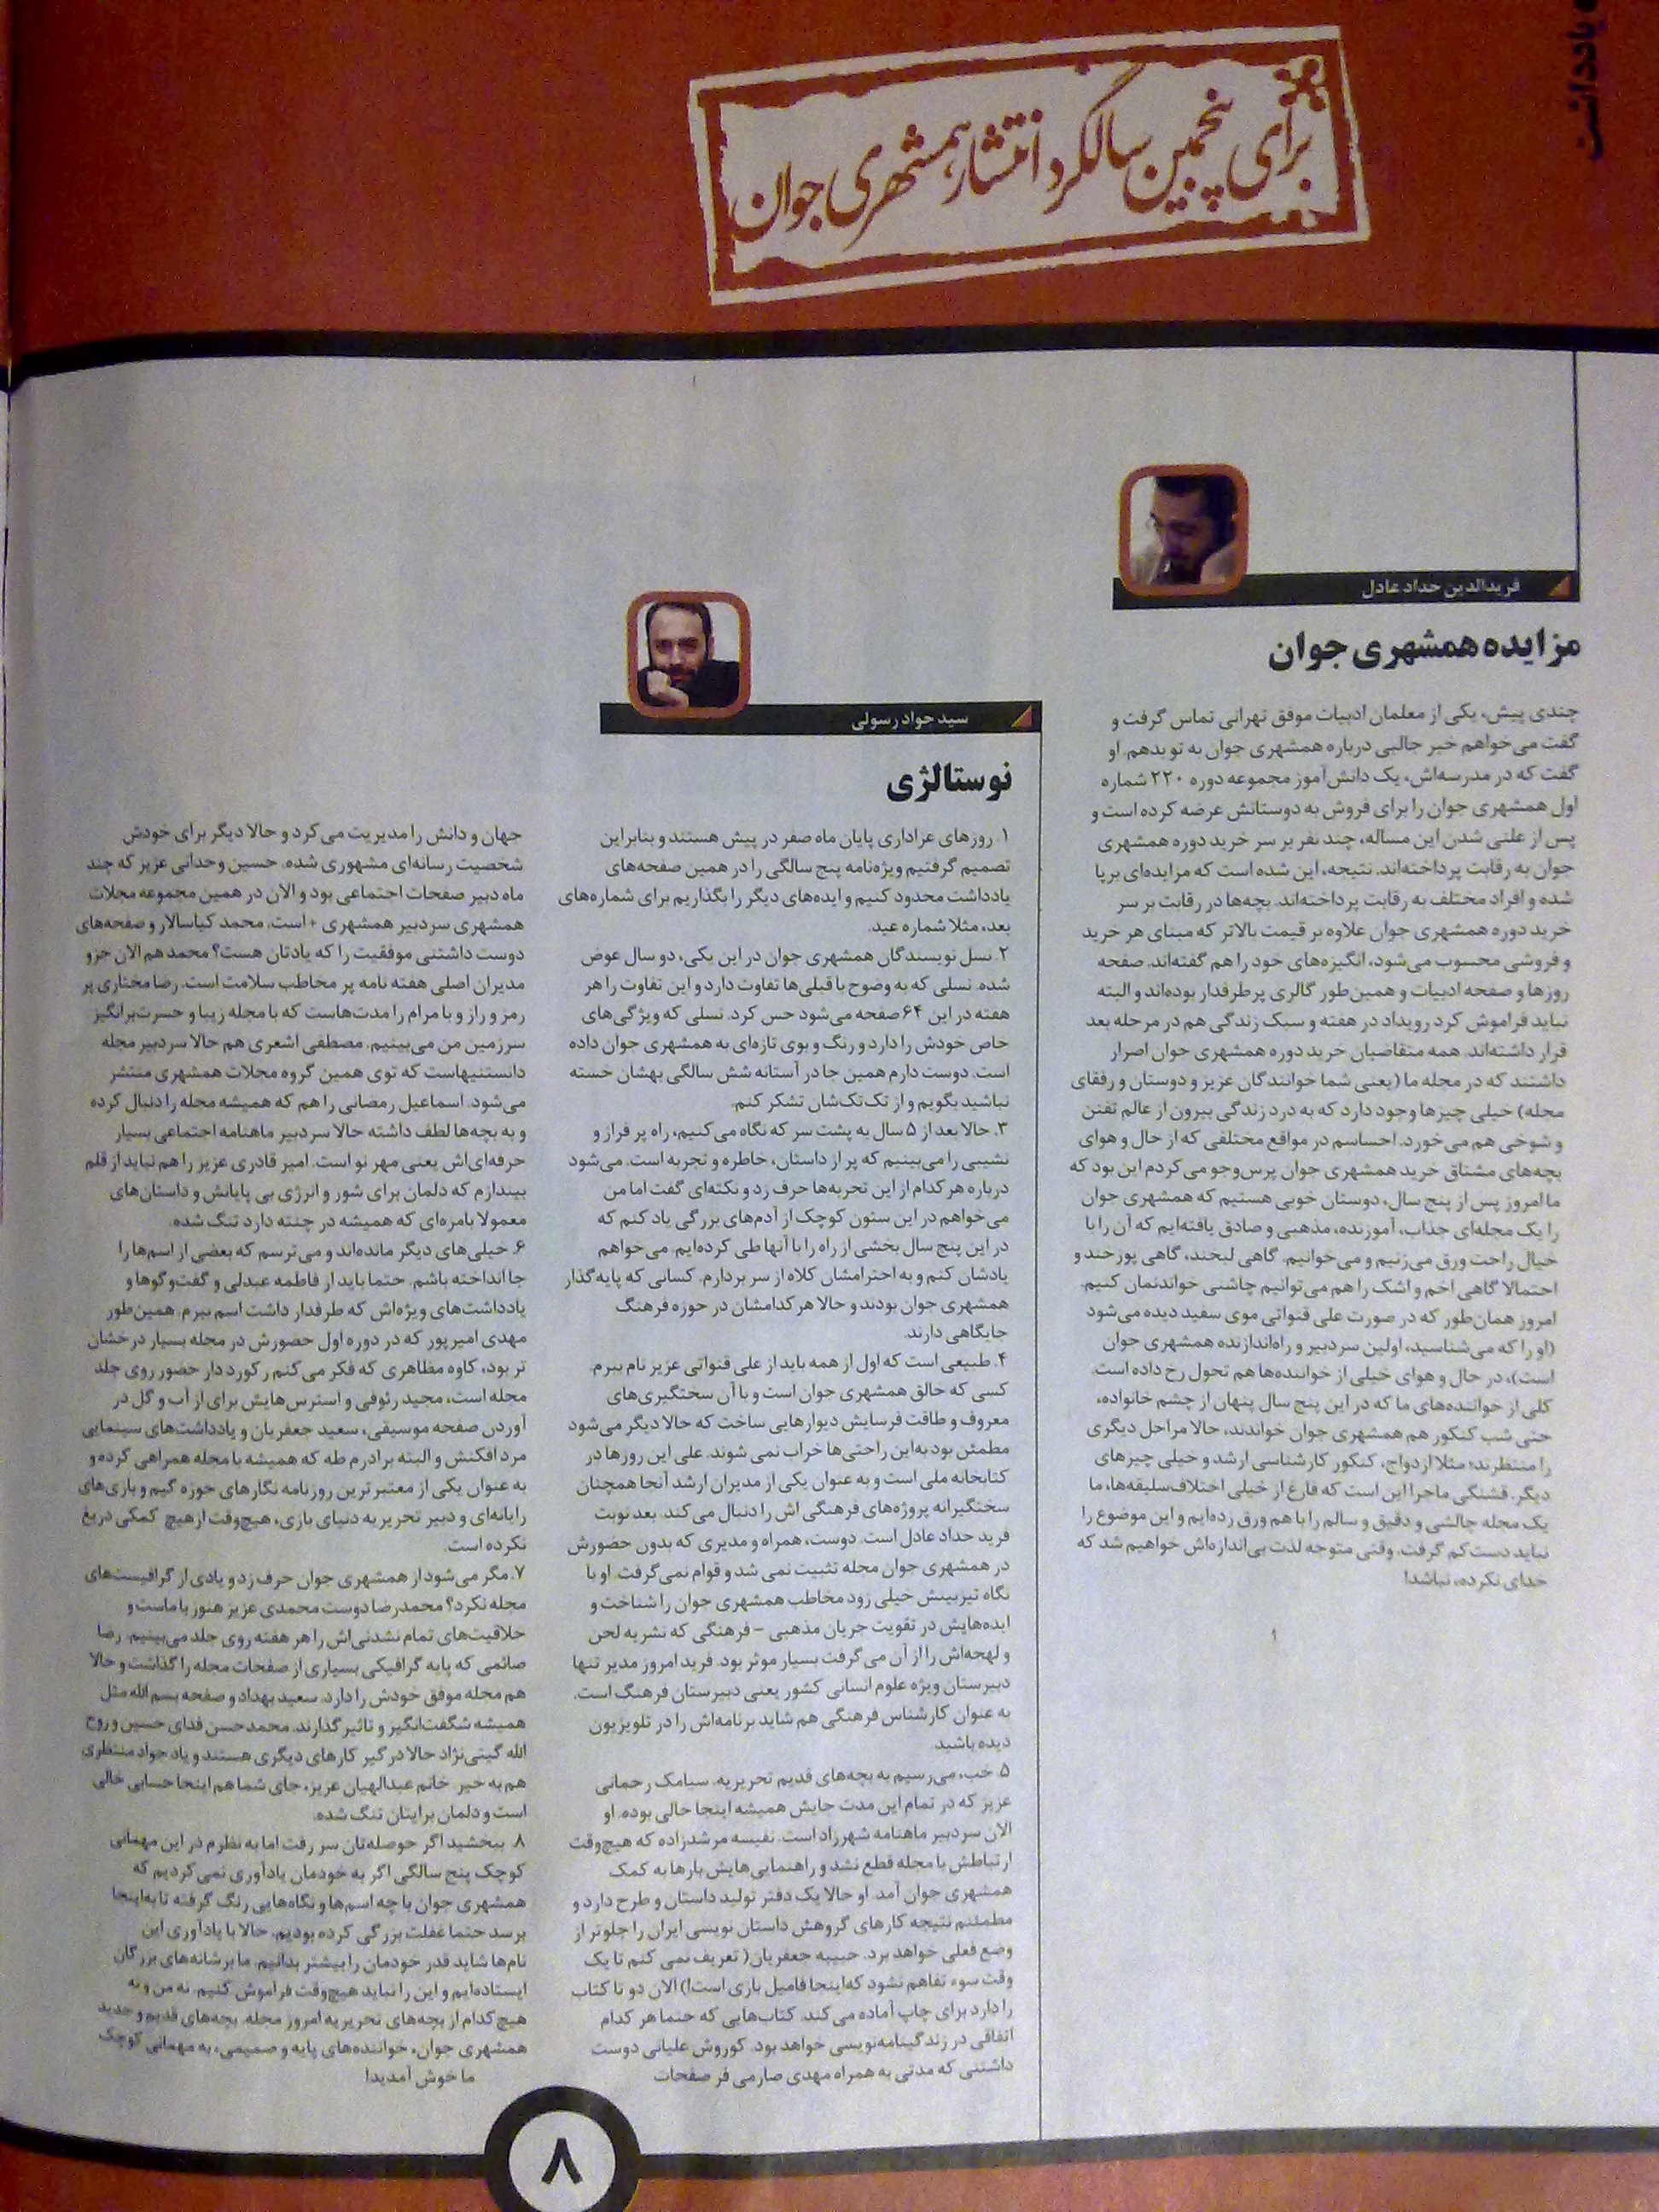 http://hadihossein.persiangig.com/image/20100214083.jpg